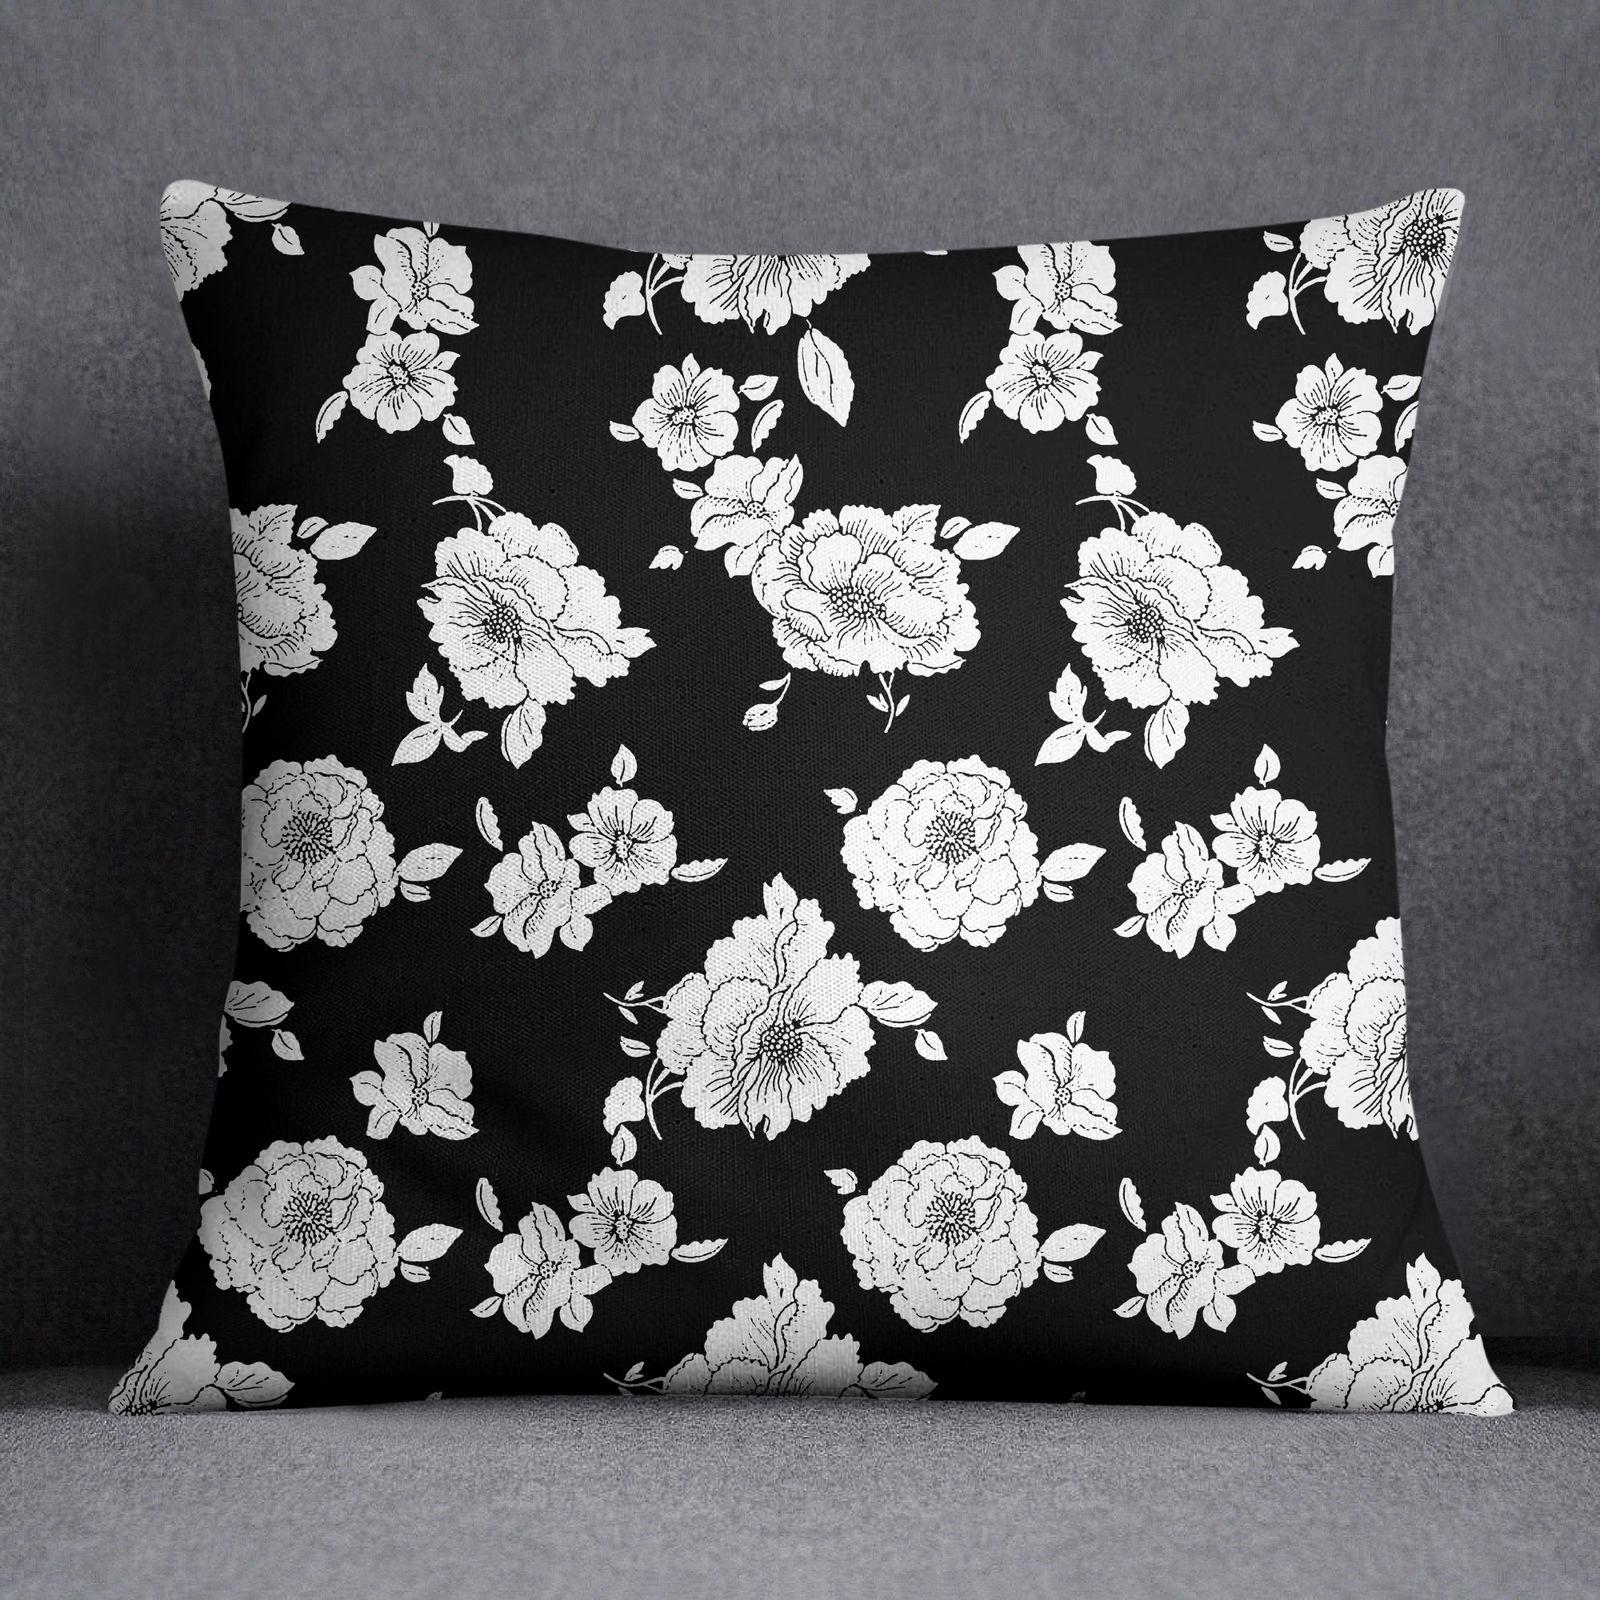 Ssassy floral print decorative pillow case black sofa cushion cover